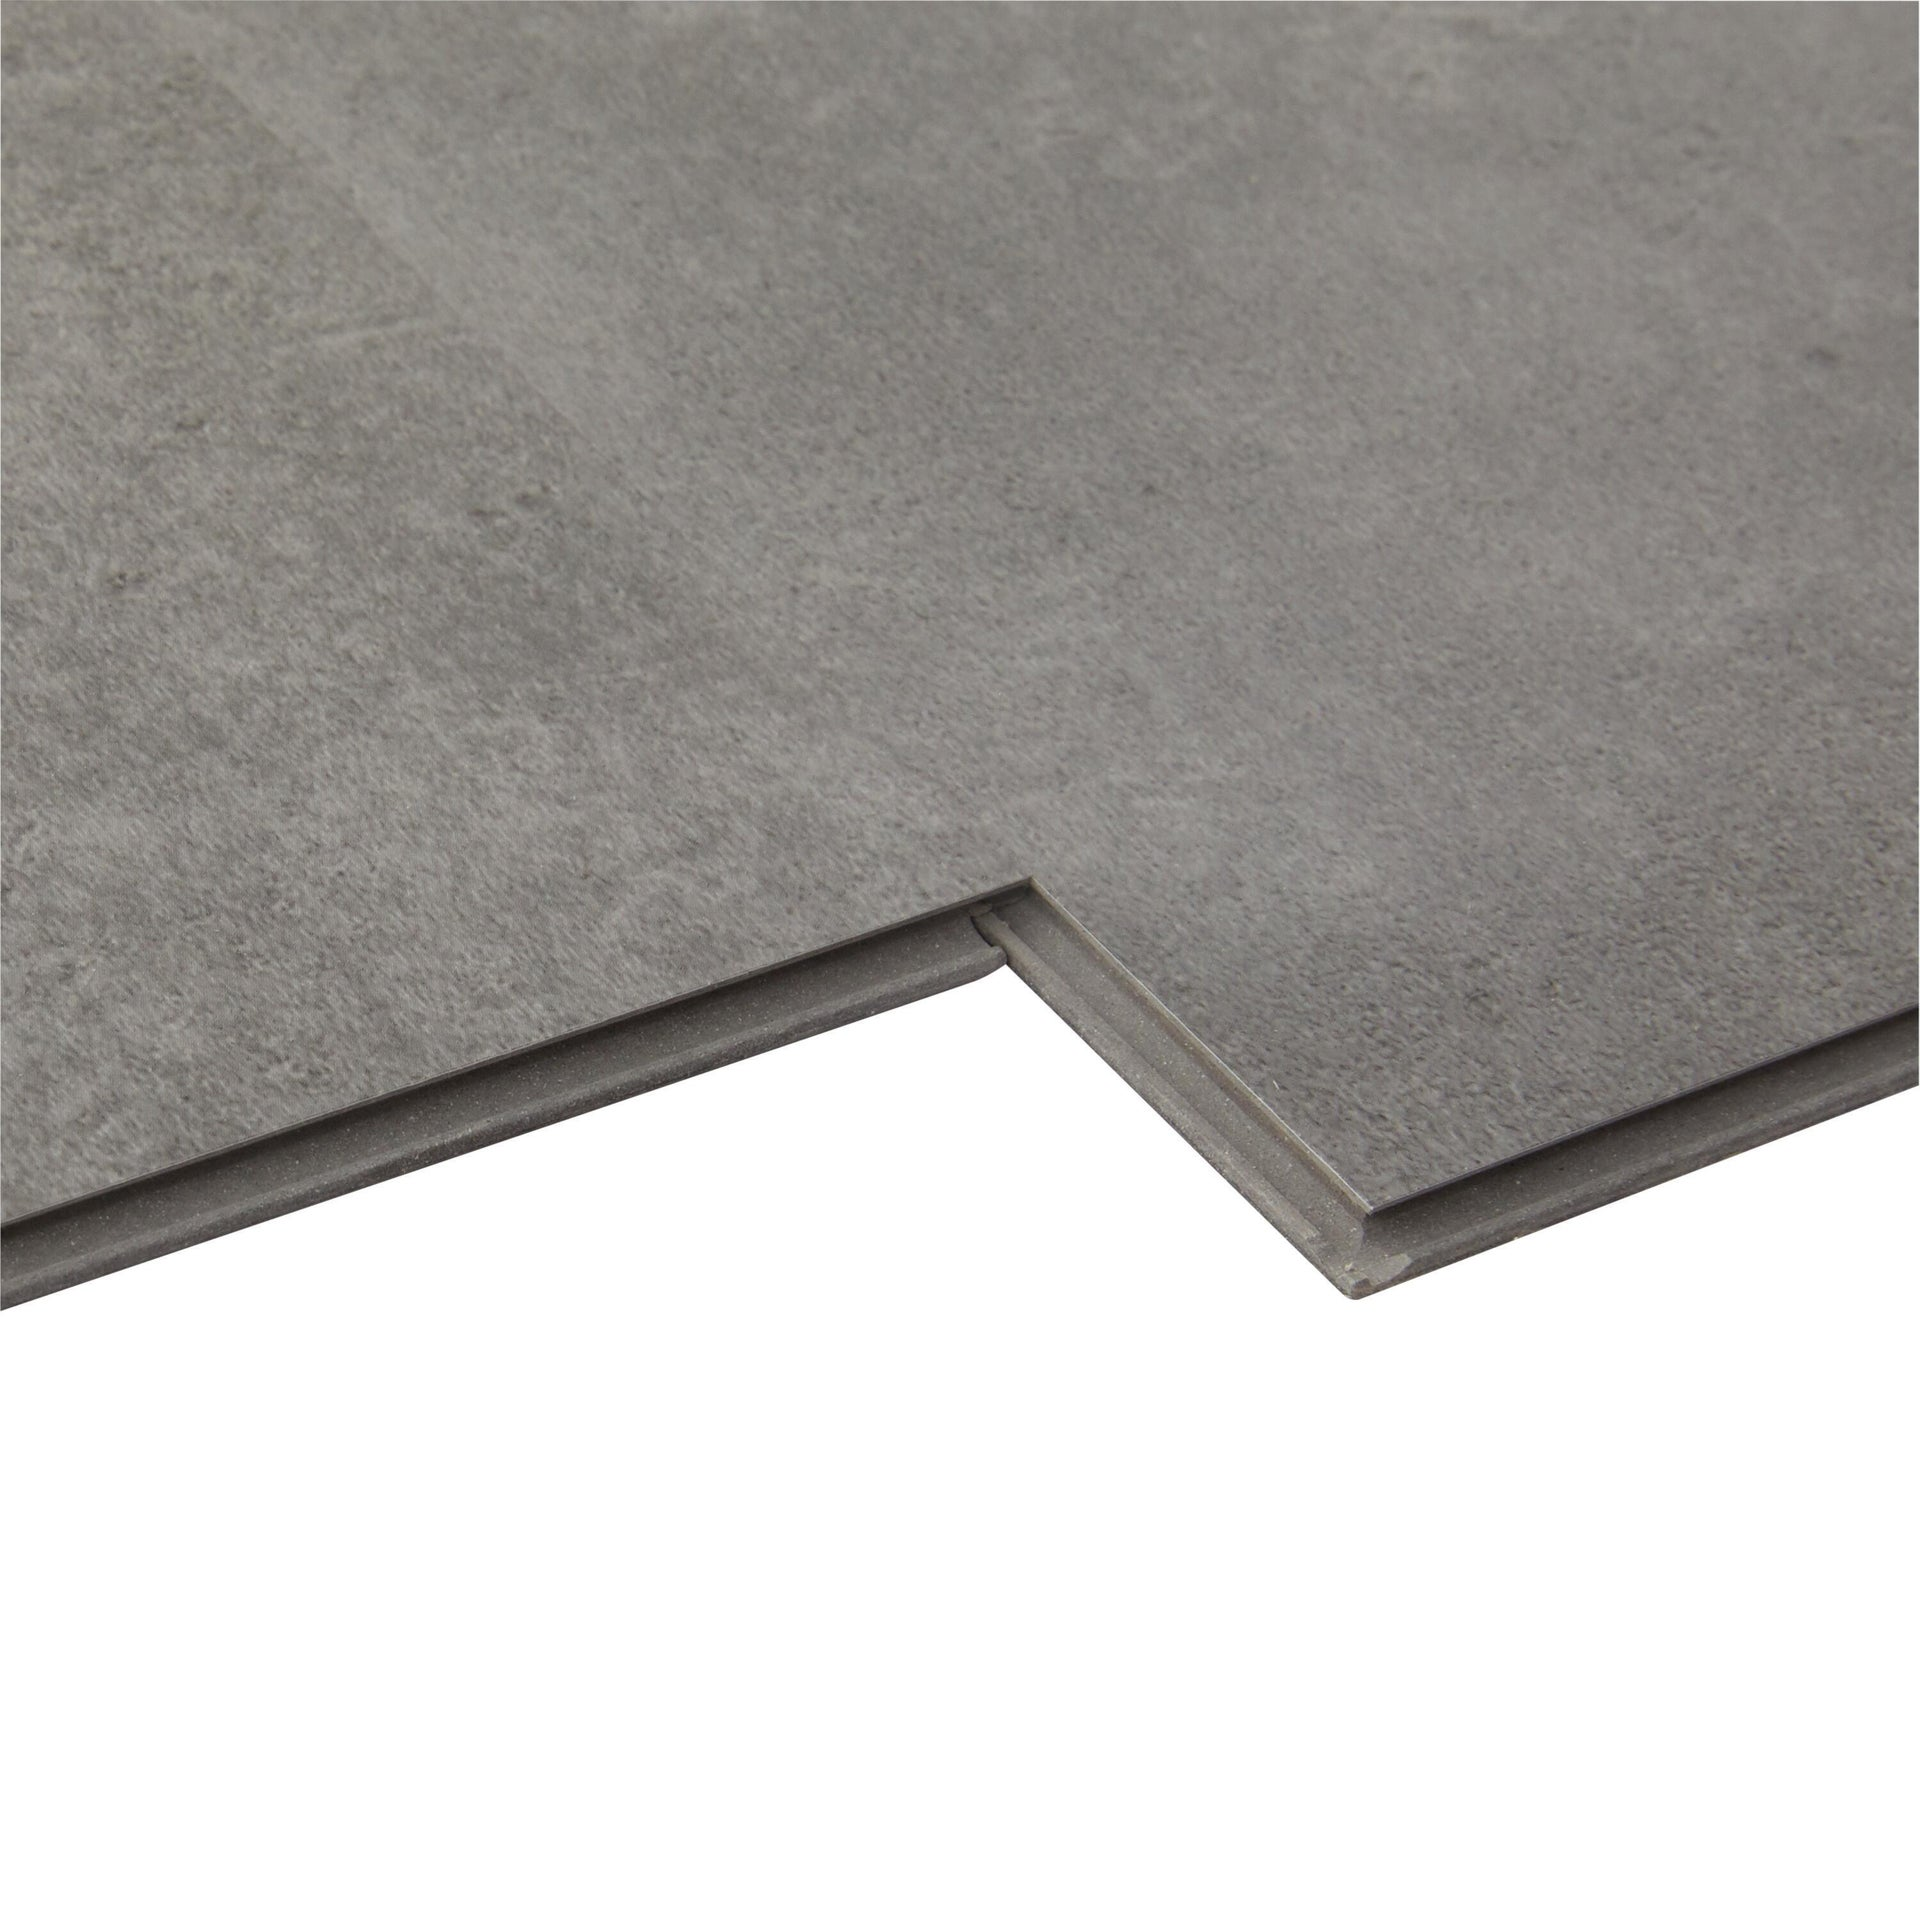 Pavimento PVC incastro Tolu Sp 4 mm grigio / argento - 15